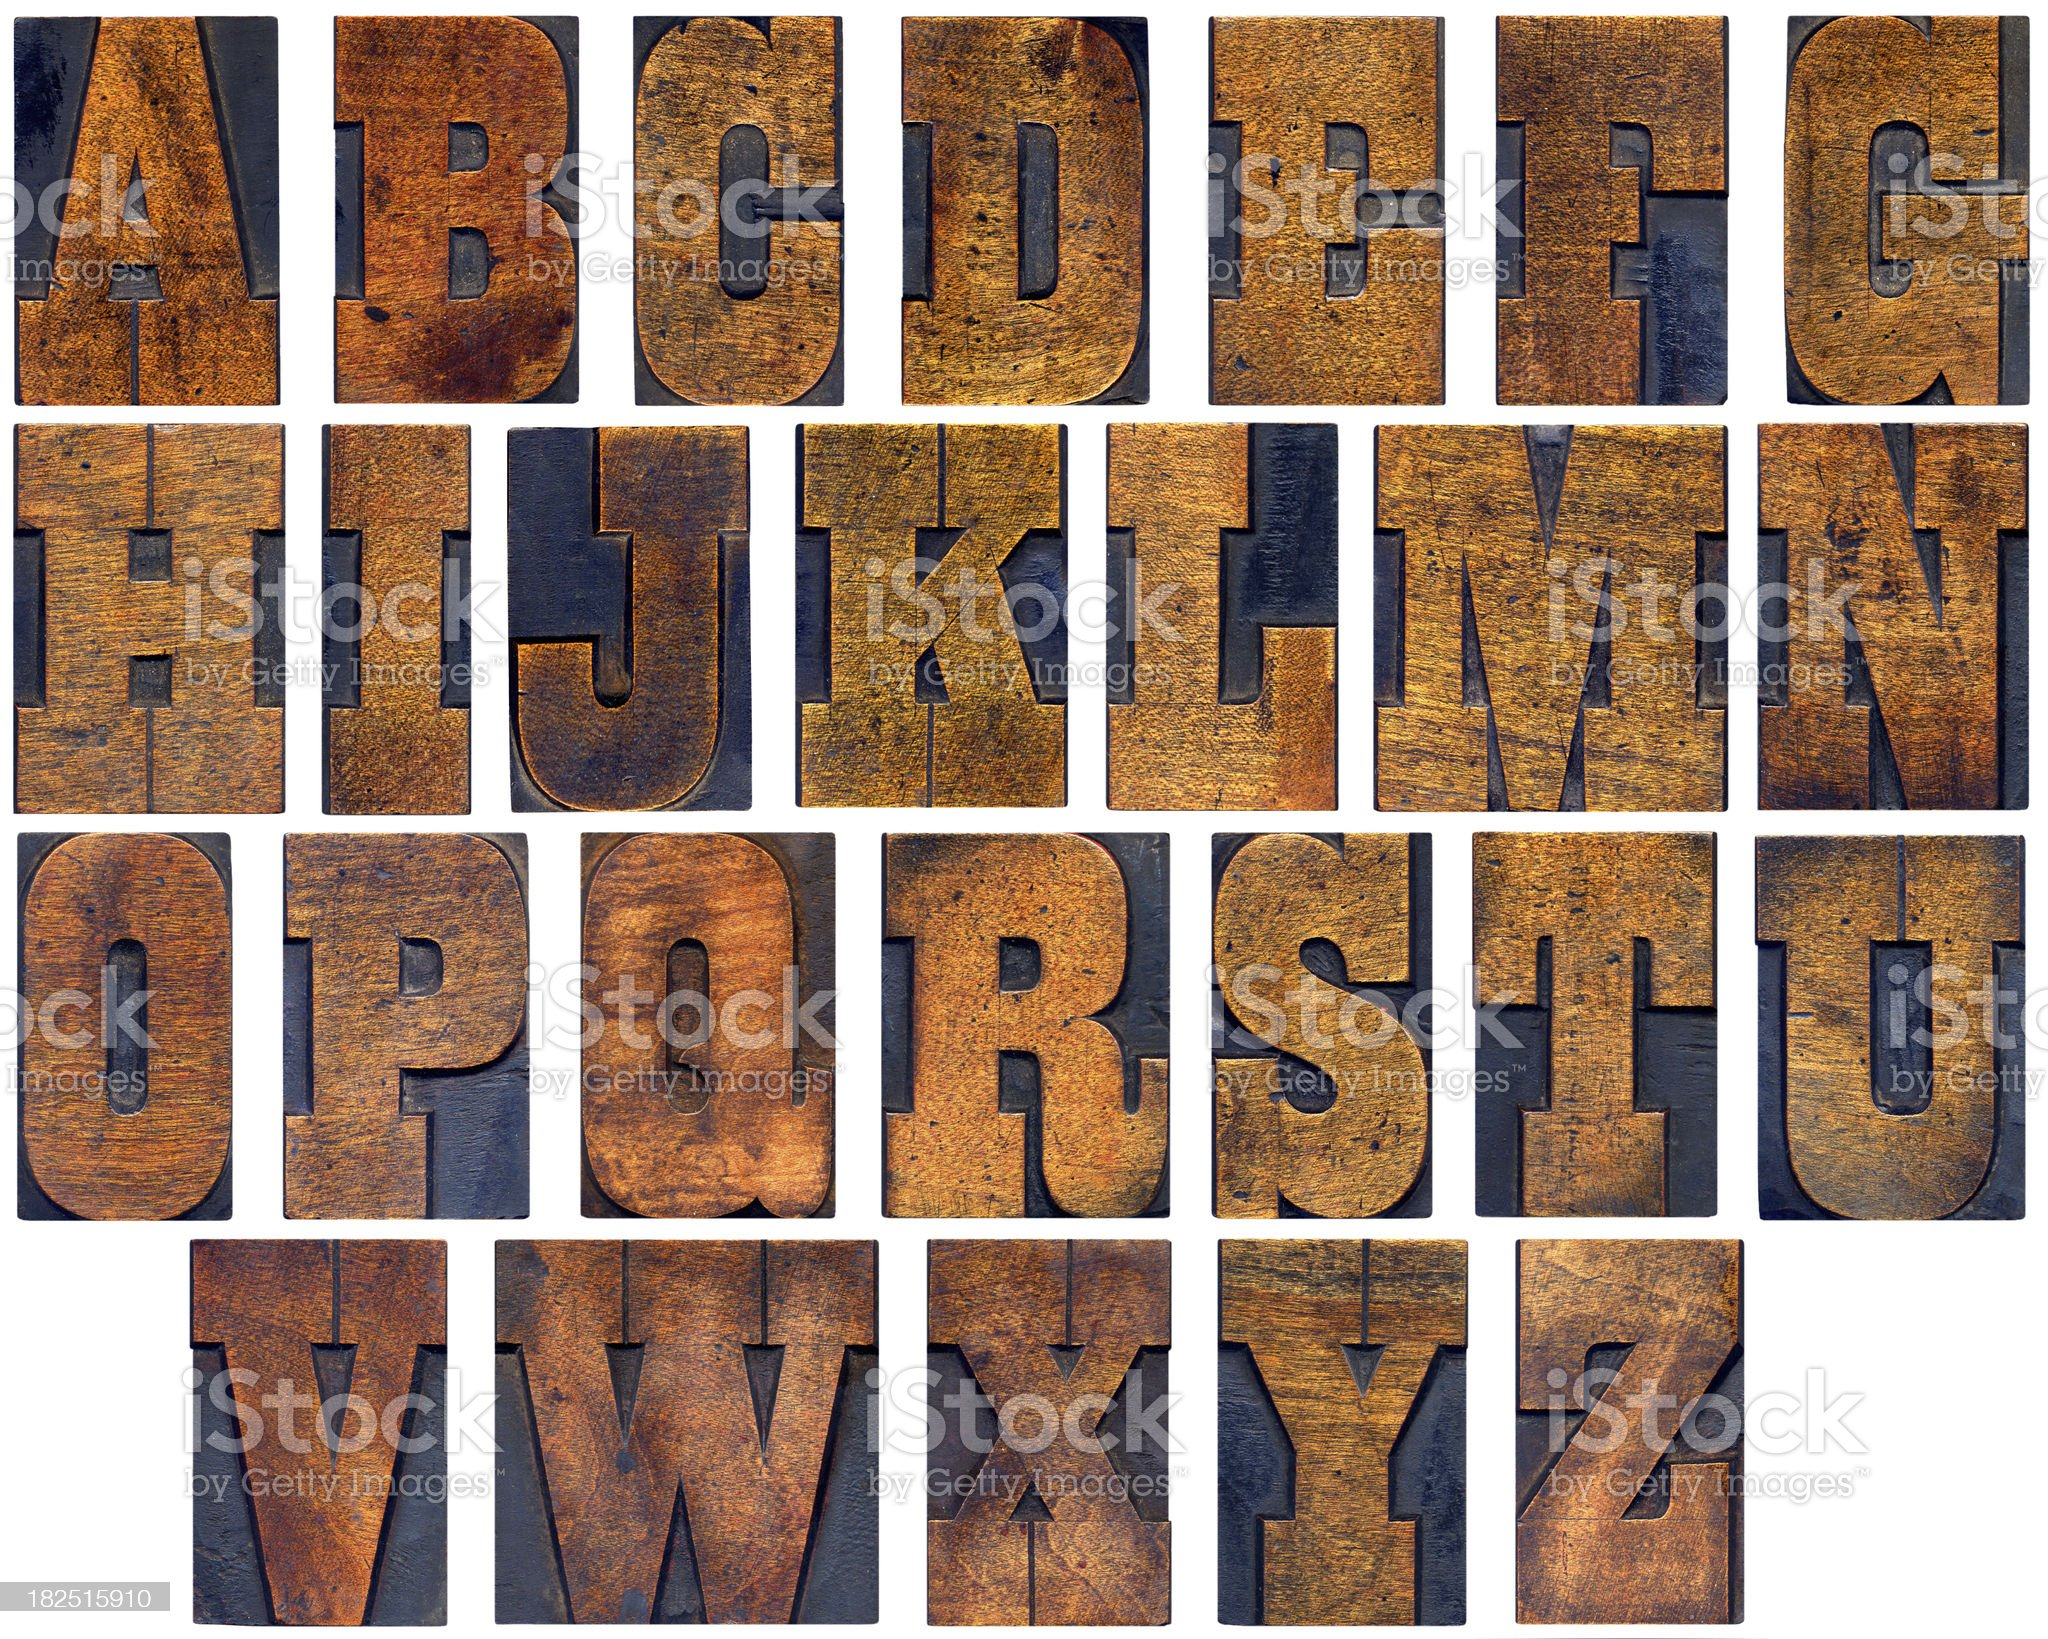 Woodblock alphabet royalty-free stock photo